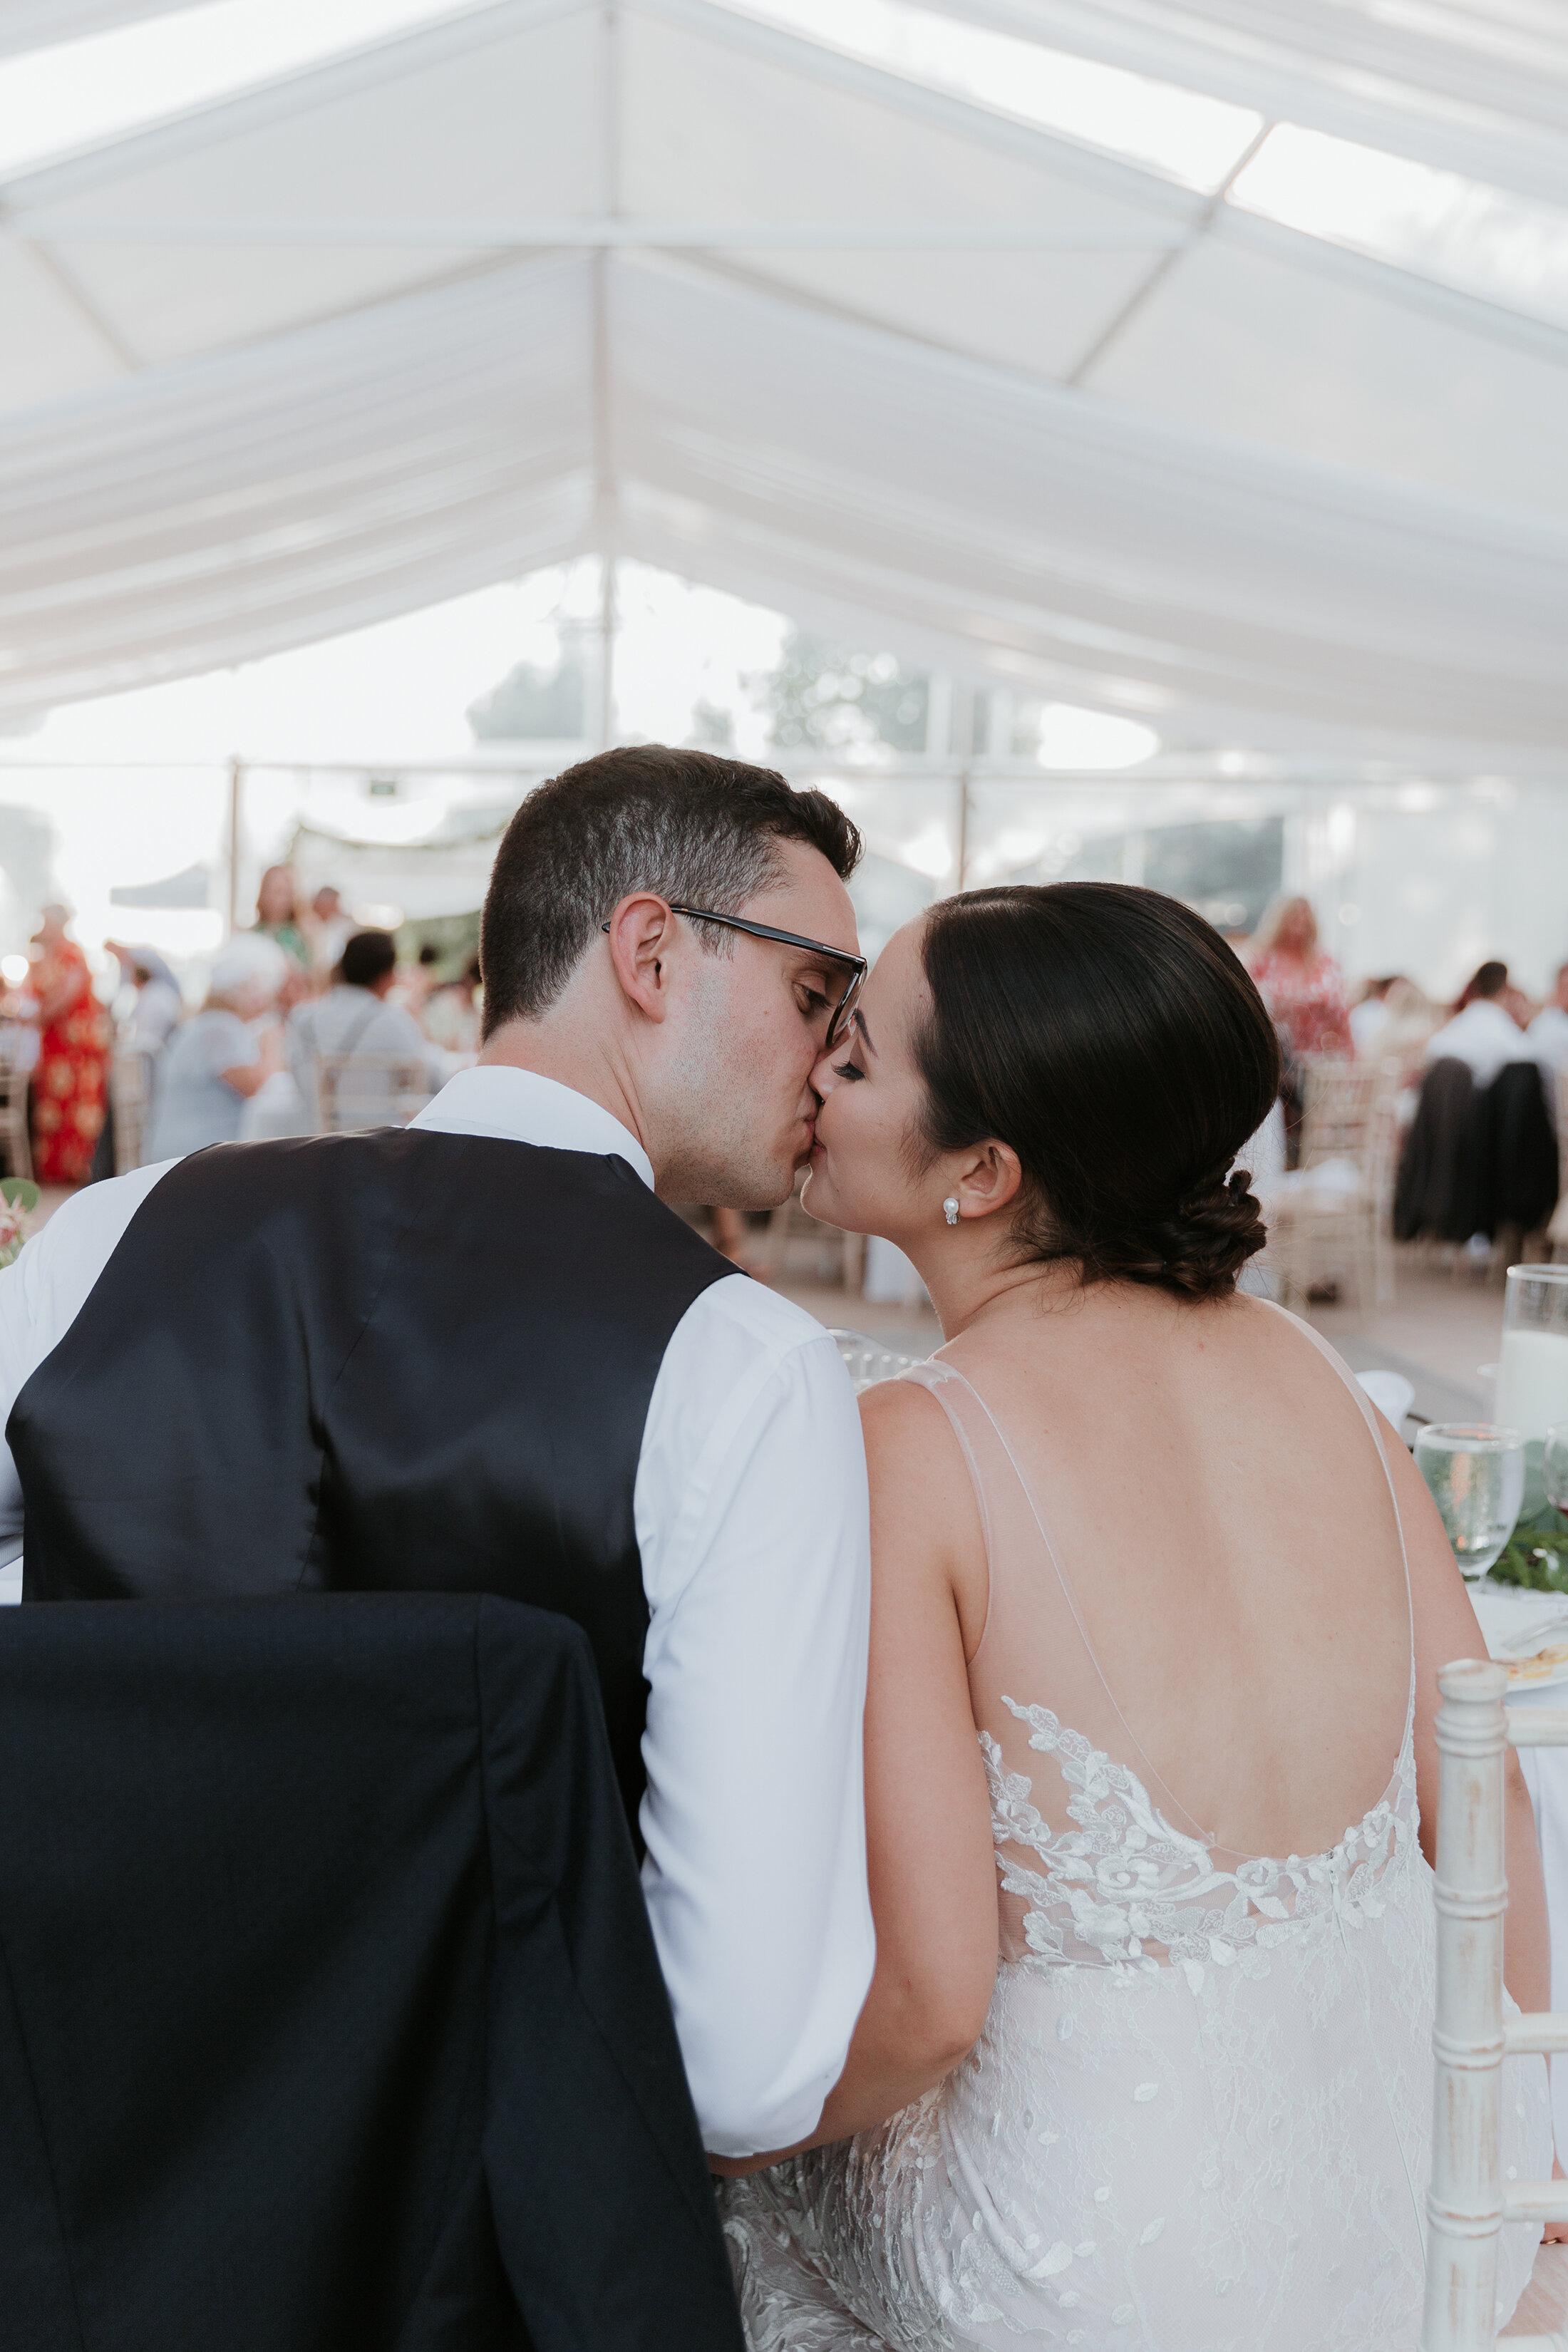 Wedding on a Hill // Ashleigh & Sean's Wedding at Hilltop Wedding Center - on the Bronte Bride Blog